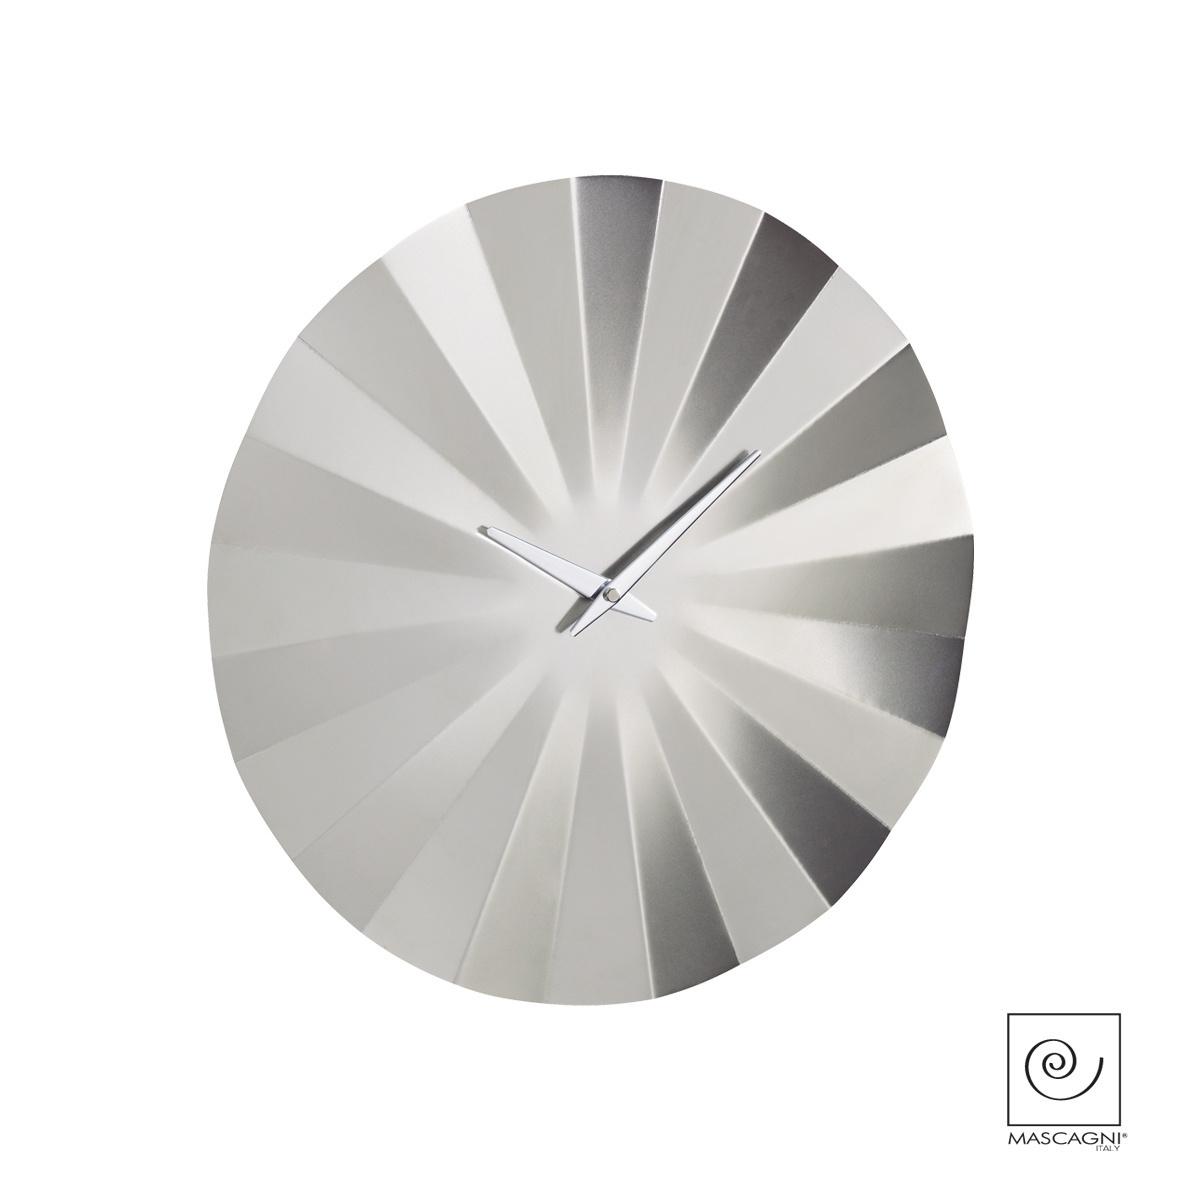 Art Mascagni M574 CLOCK DIAM.40 - COL.SILVER